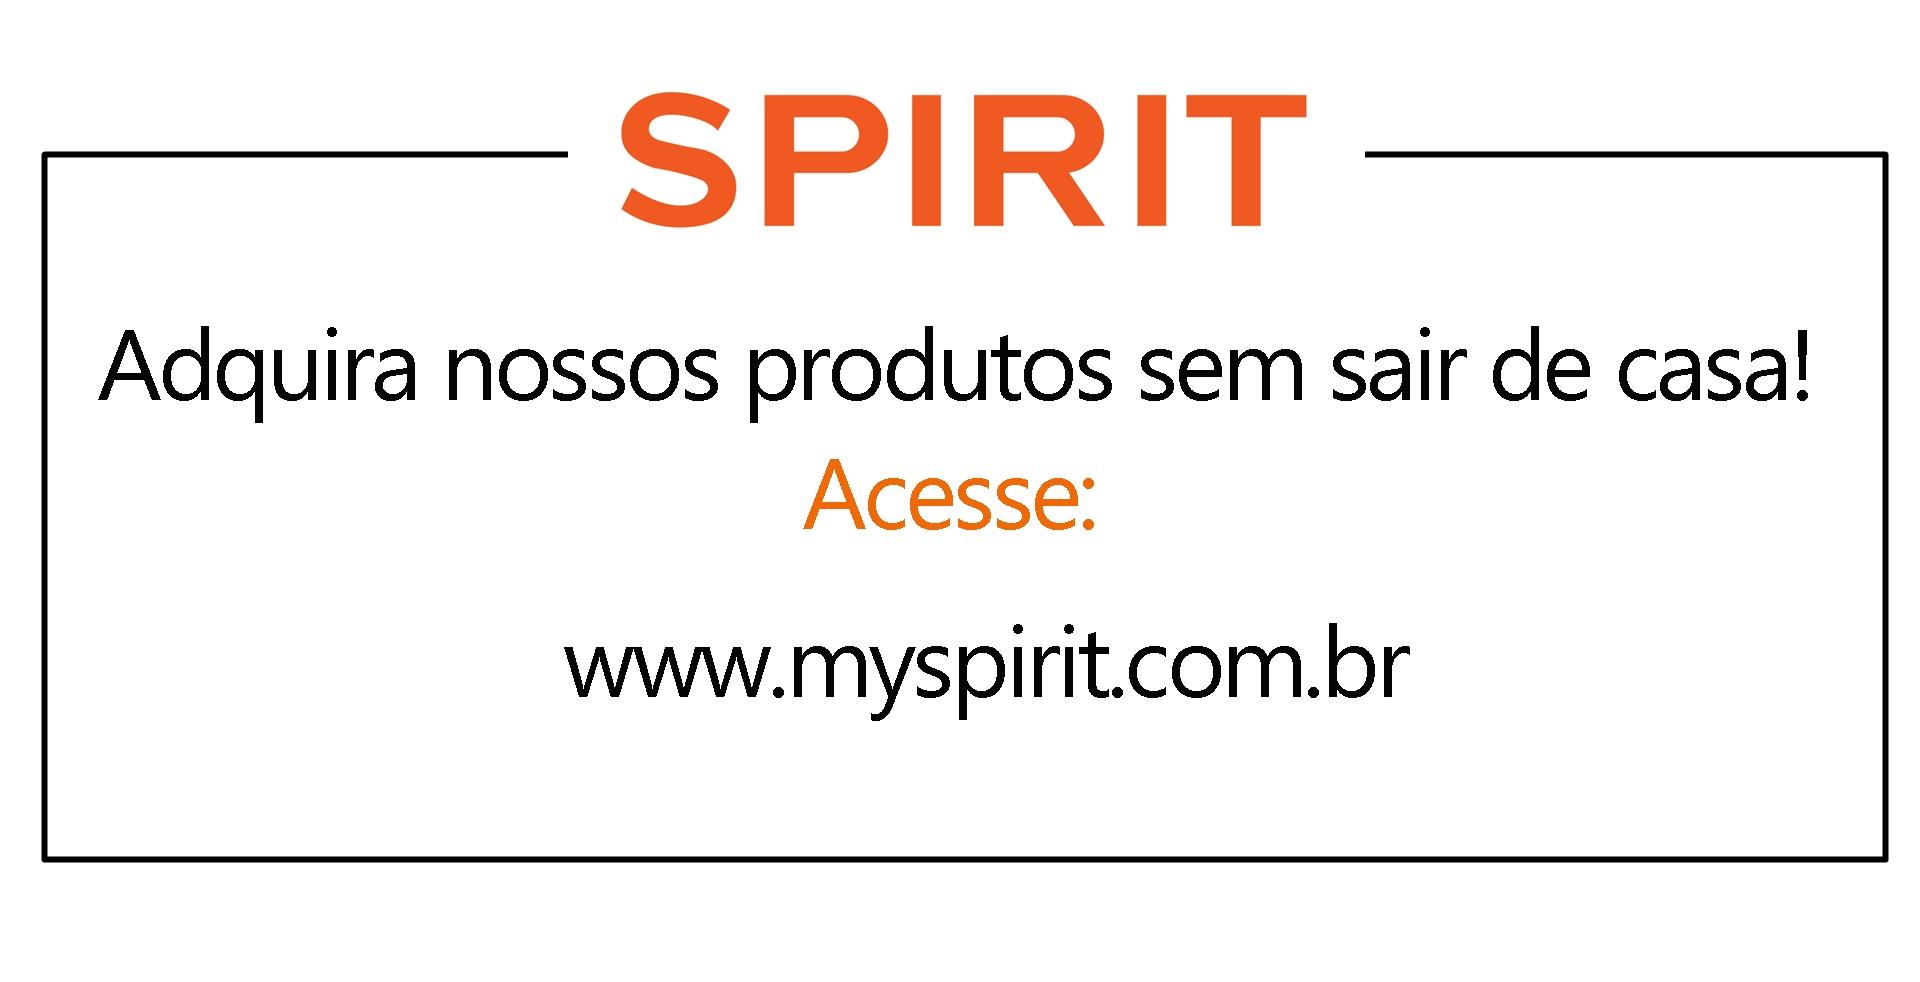 Ventilador de teto Spirit - Blog Myspirit - banner site Spirit - como montar Árvore de Natal